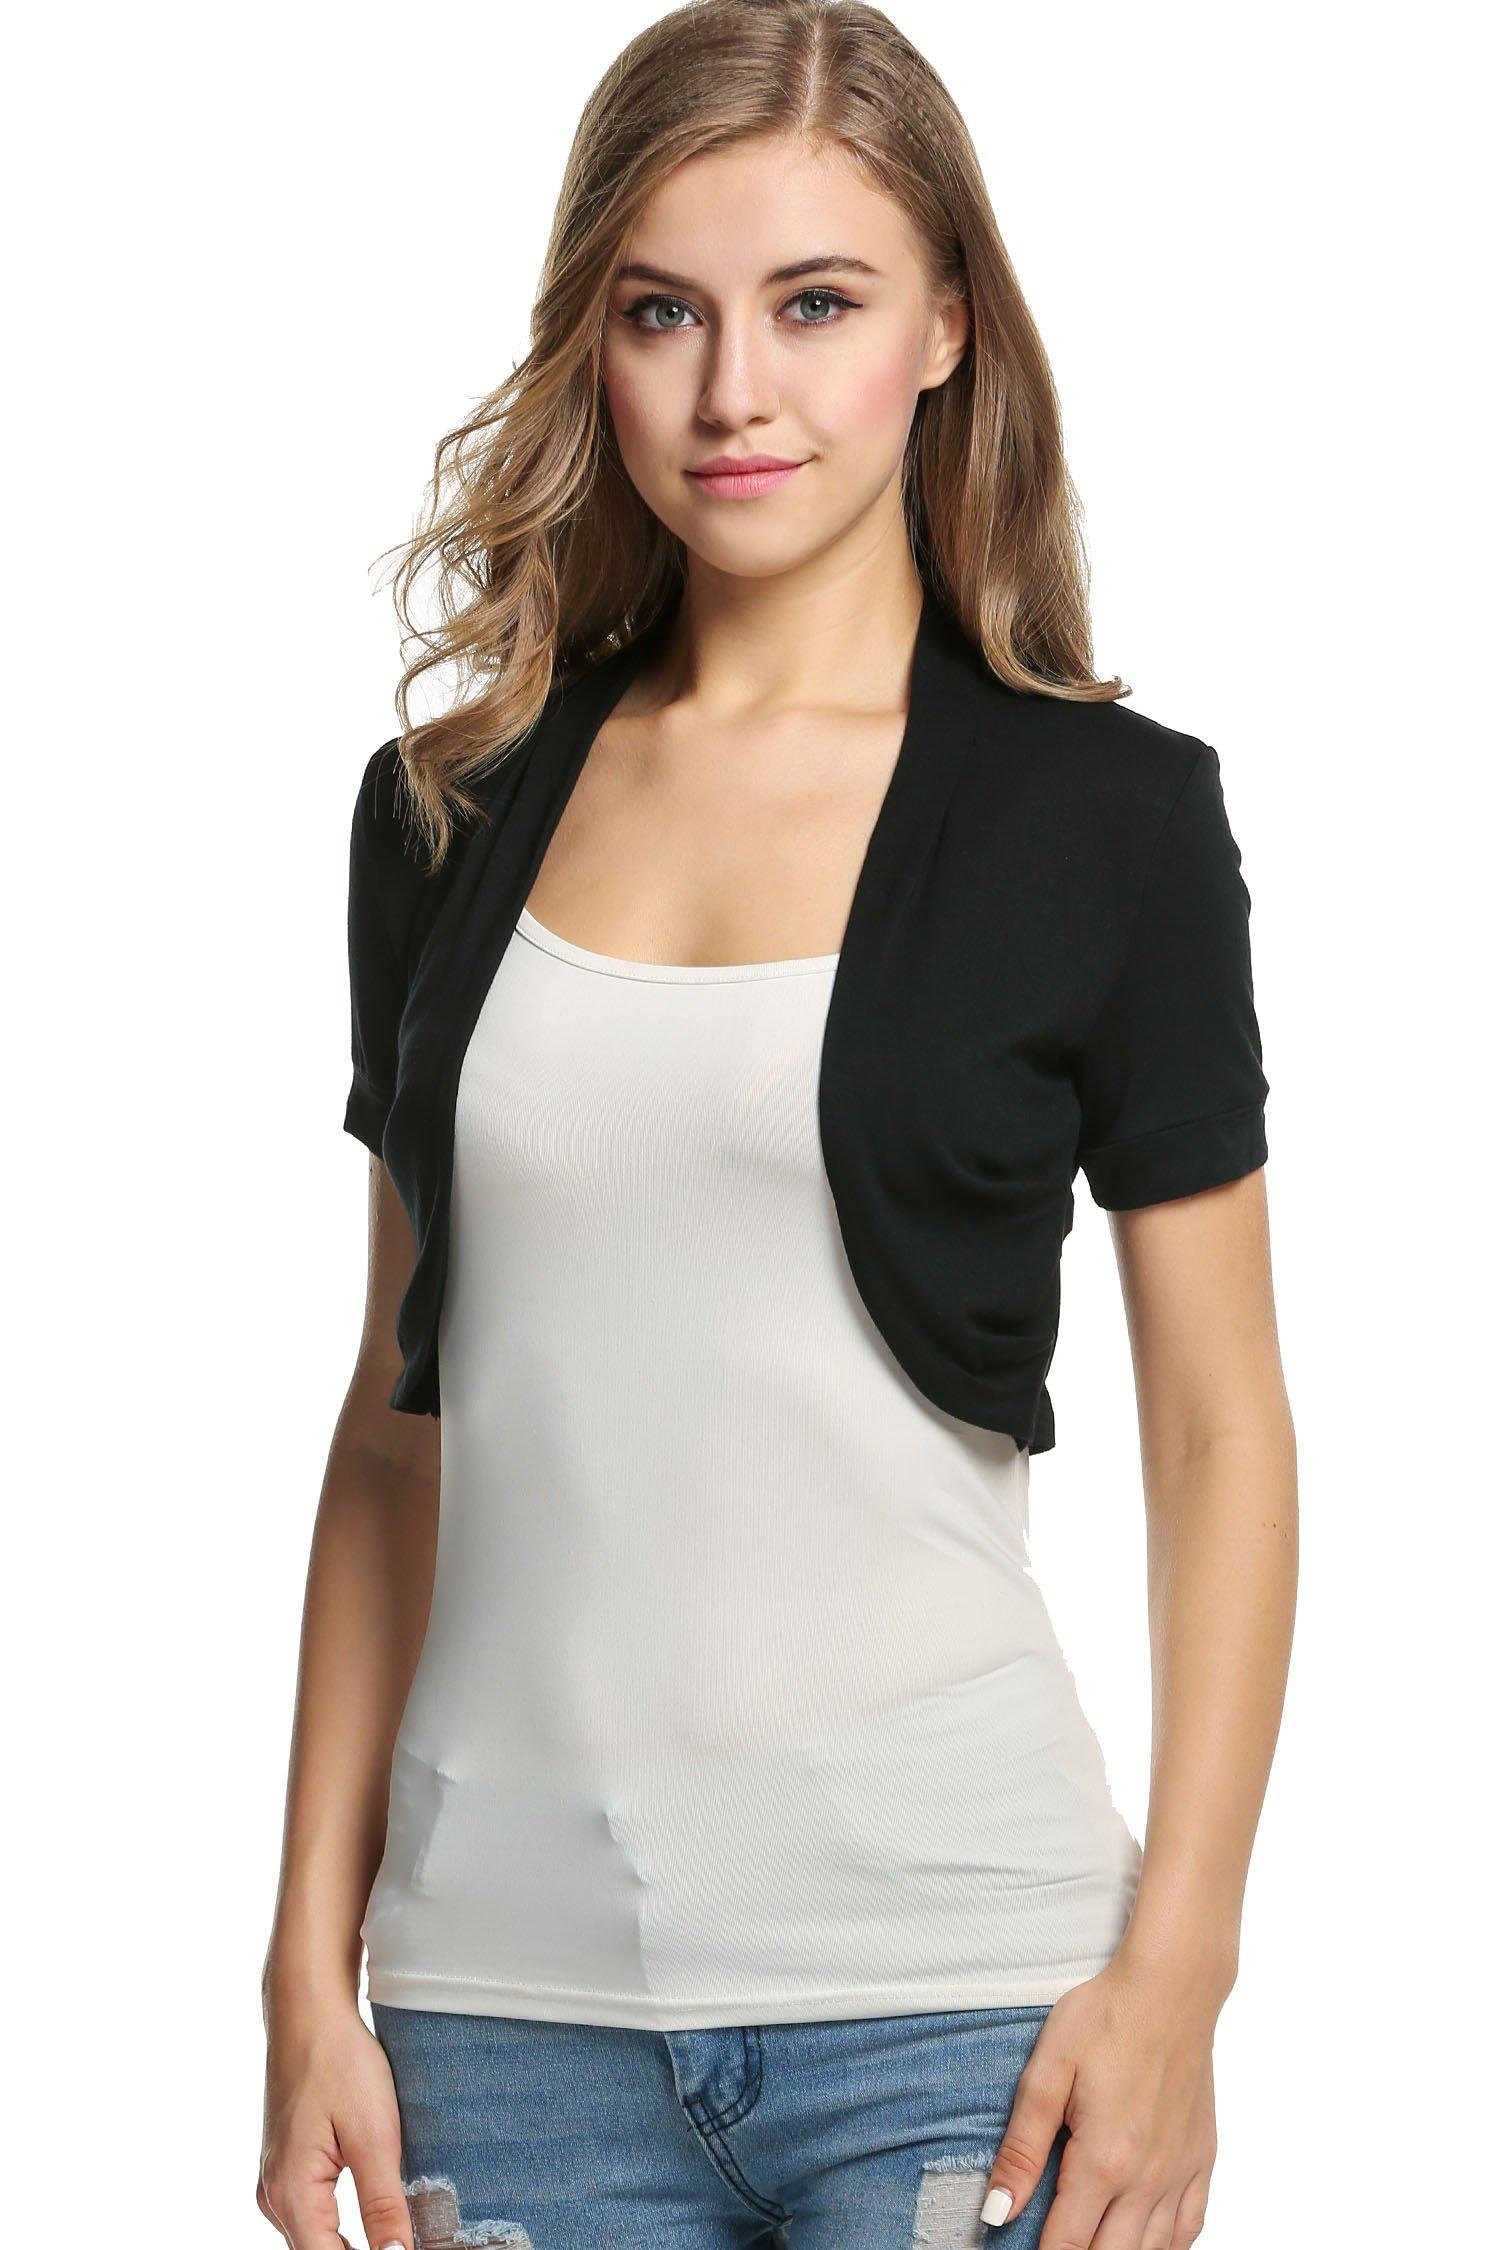 BEAUTYTALK Women's Junior's Bolero Shrug Jacket Cardigan Short Sleeve(Black,XS)